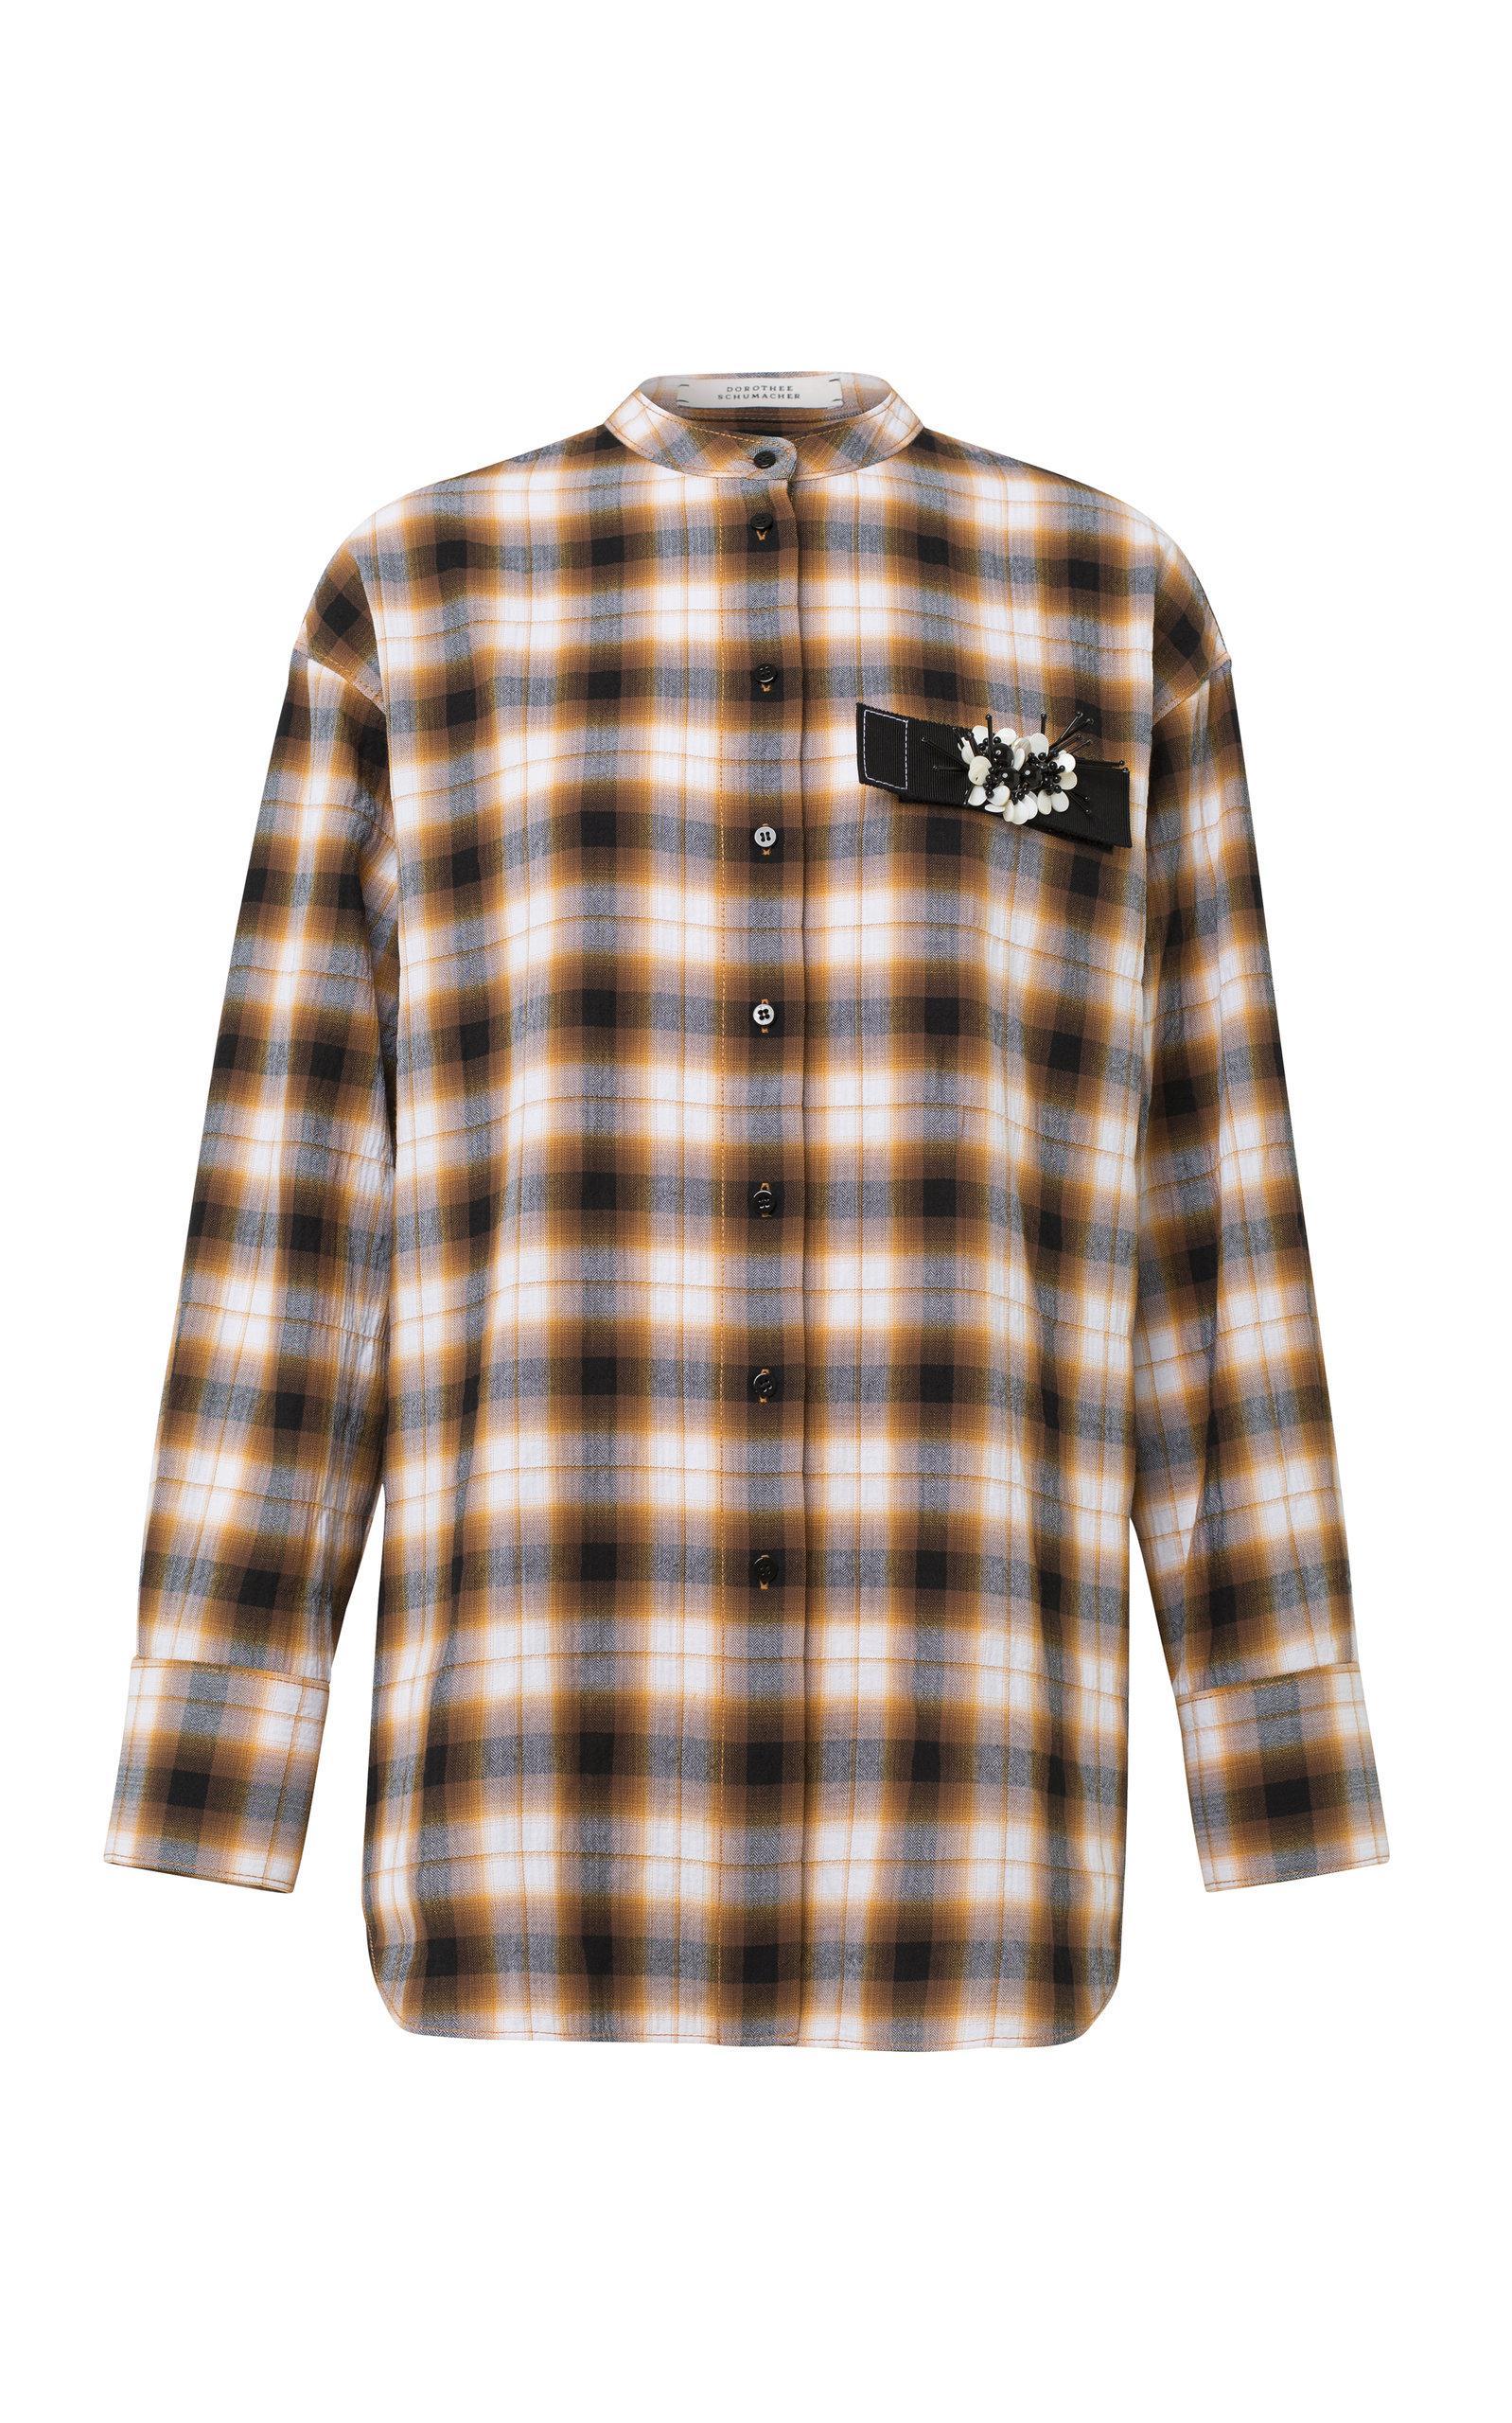 dorothee schumacher fragmented checks long sleeve cotton blend top in orange lyst. Black Bedroom Furniture Sets. Home Design Ideas